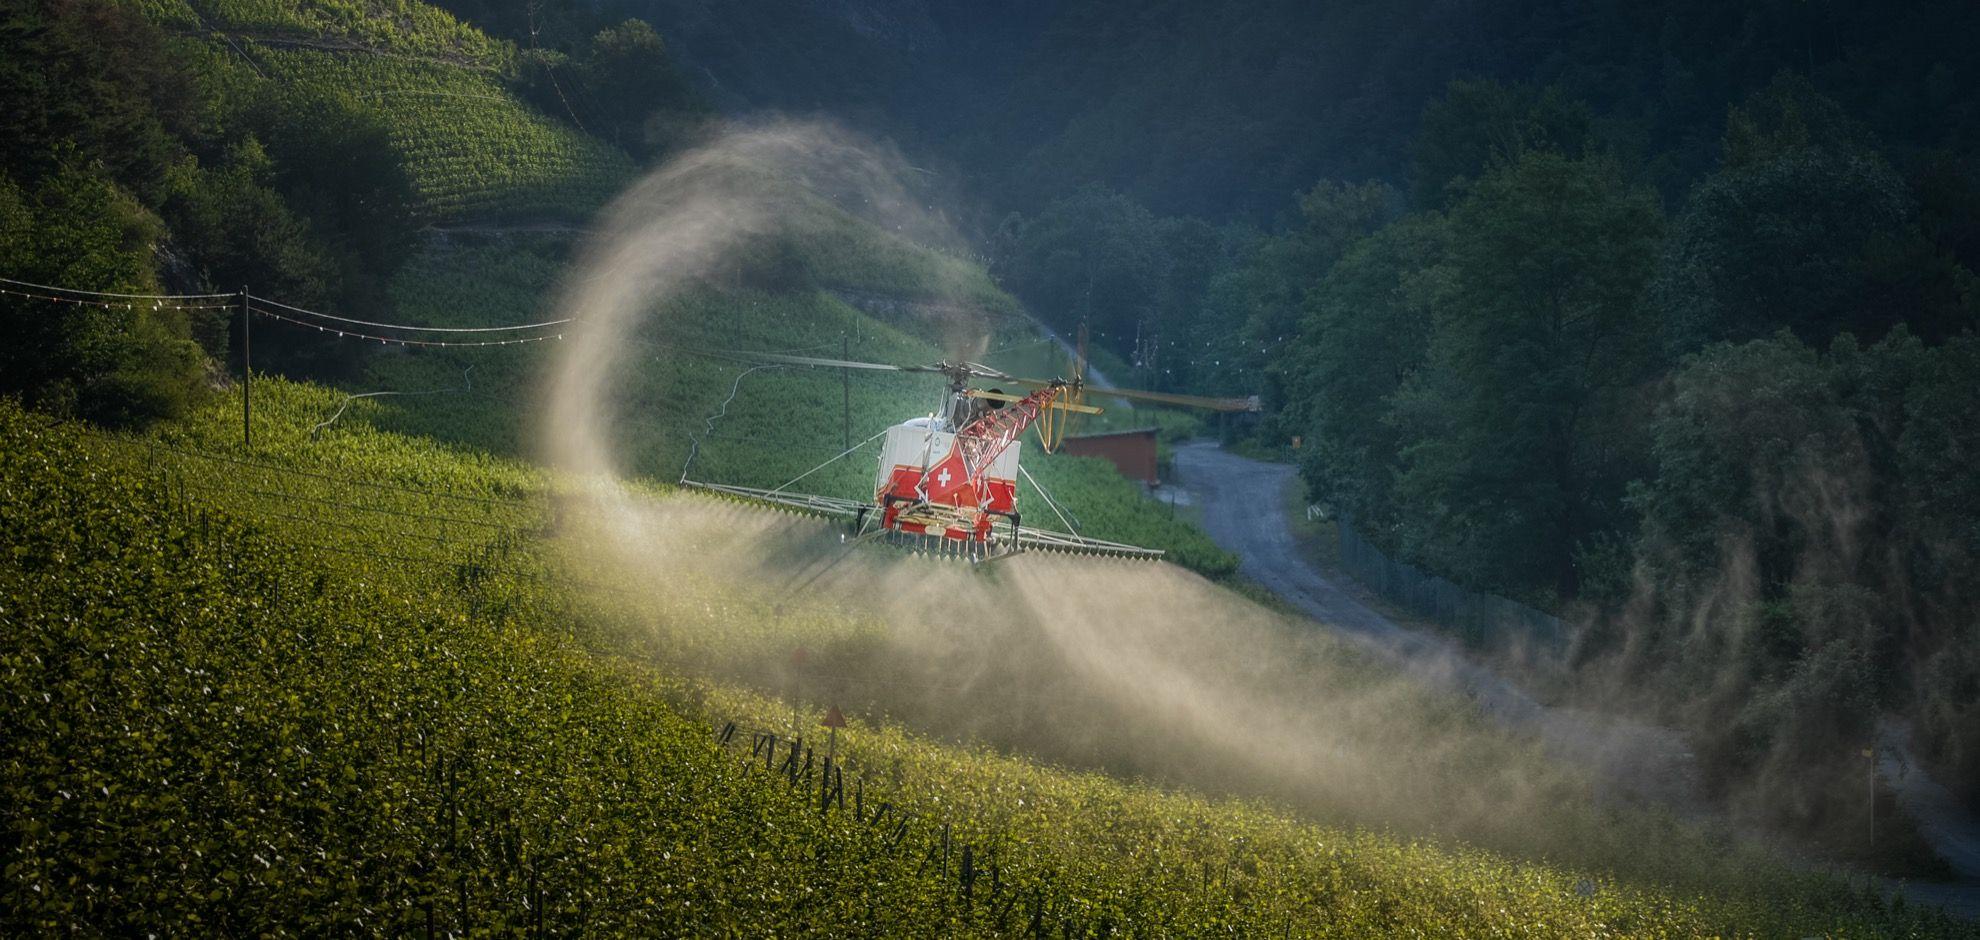 The VRASF Vuichard Recovery Aviation Safety Foundation